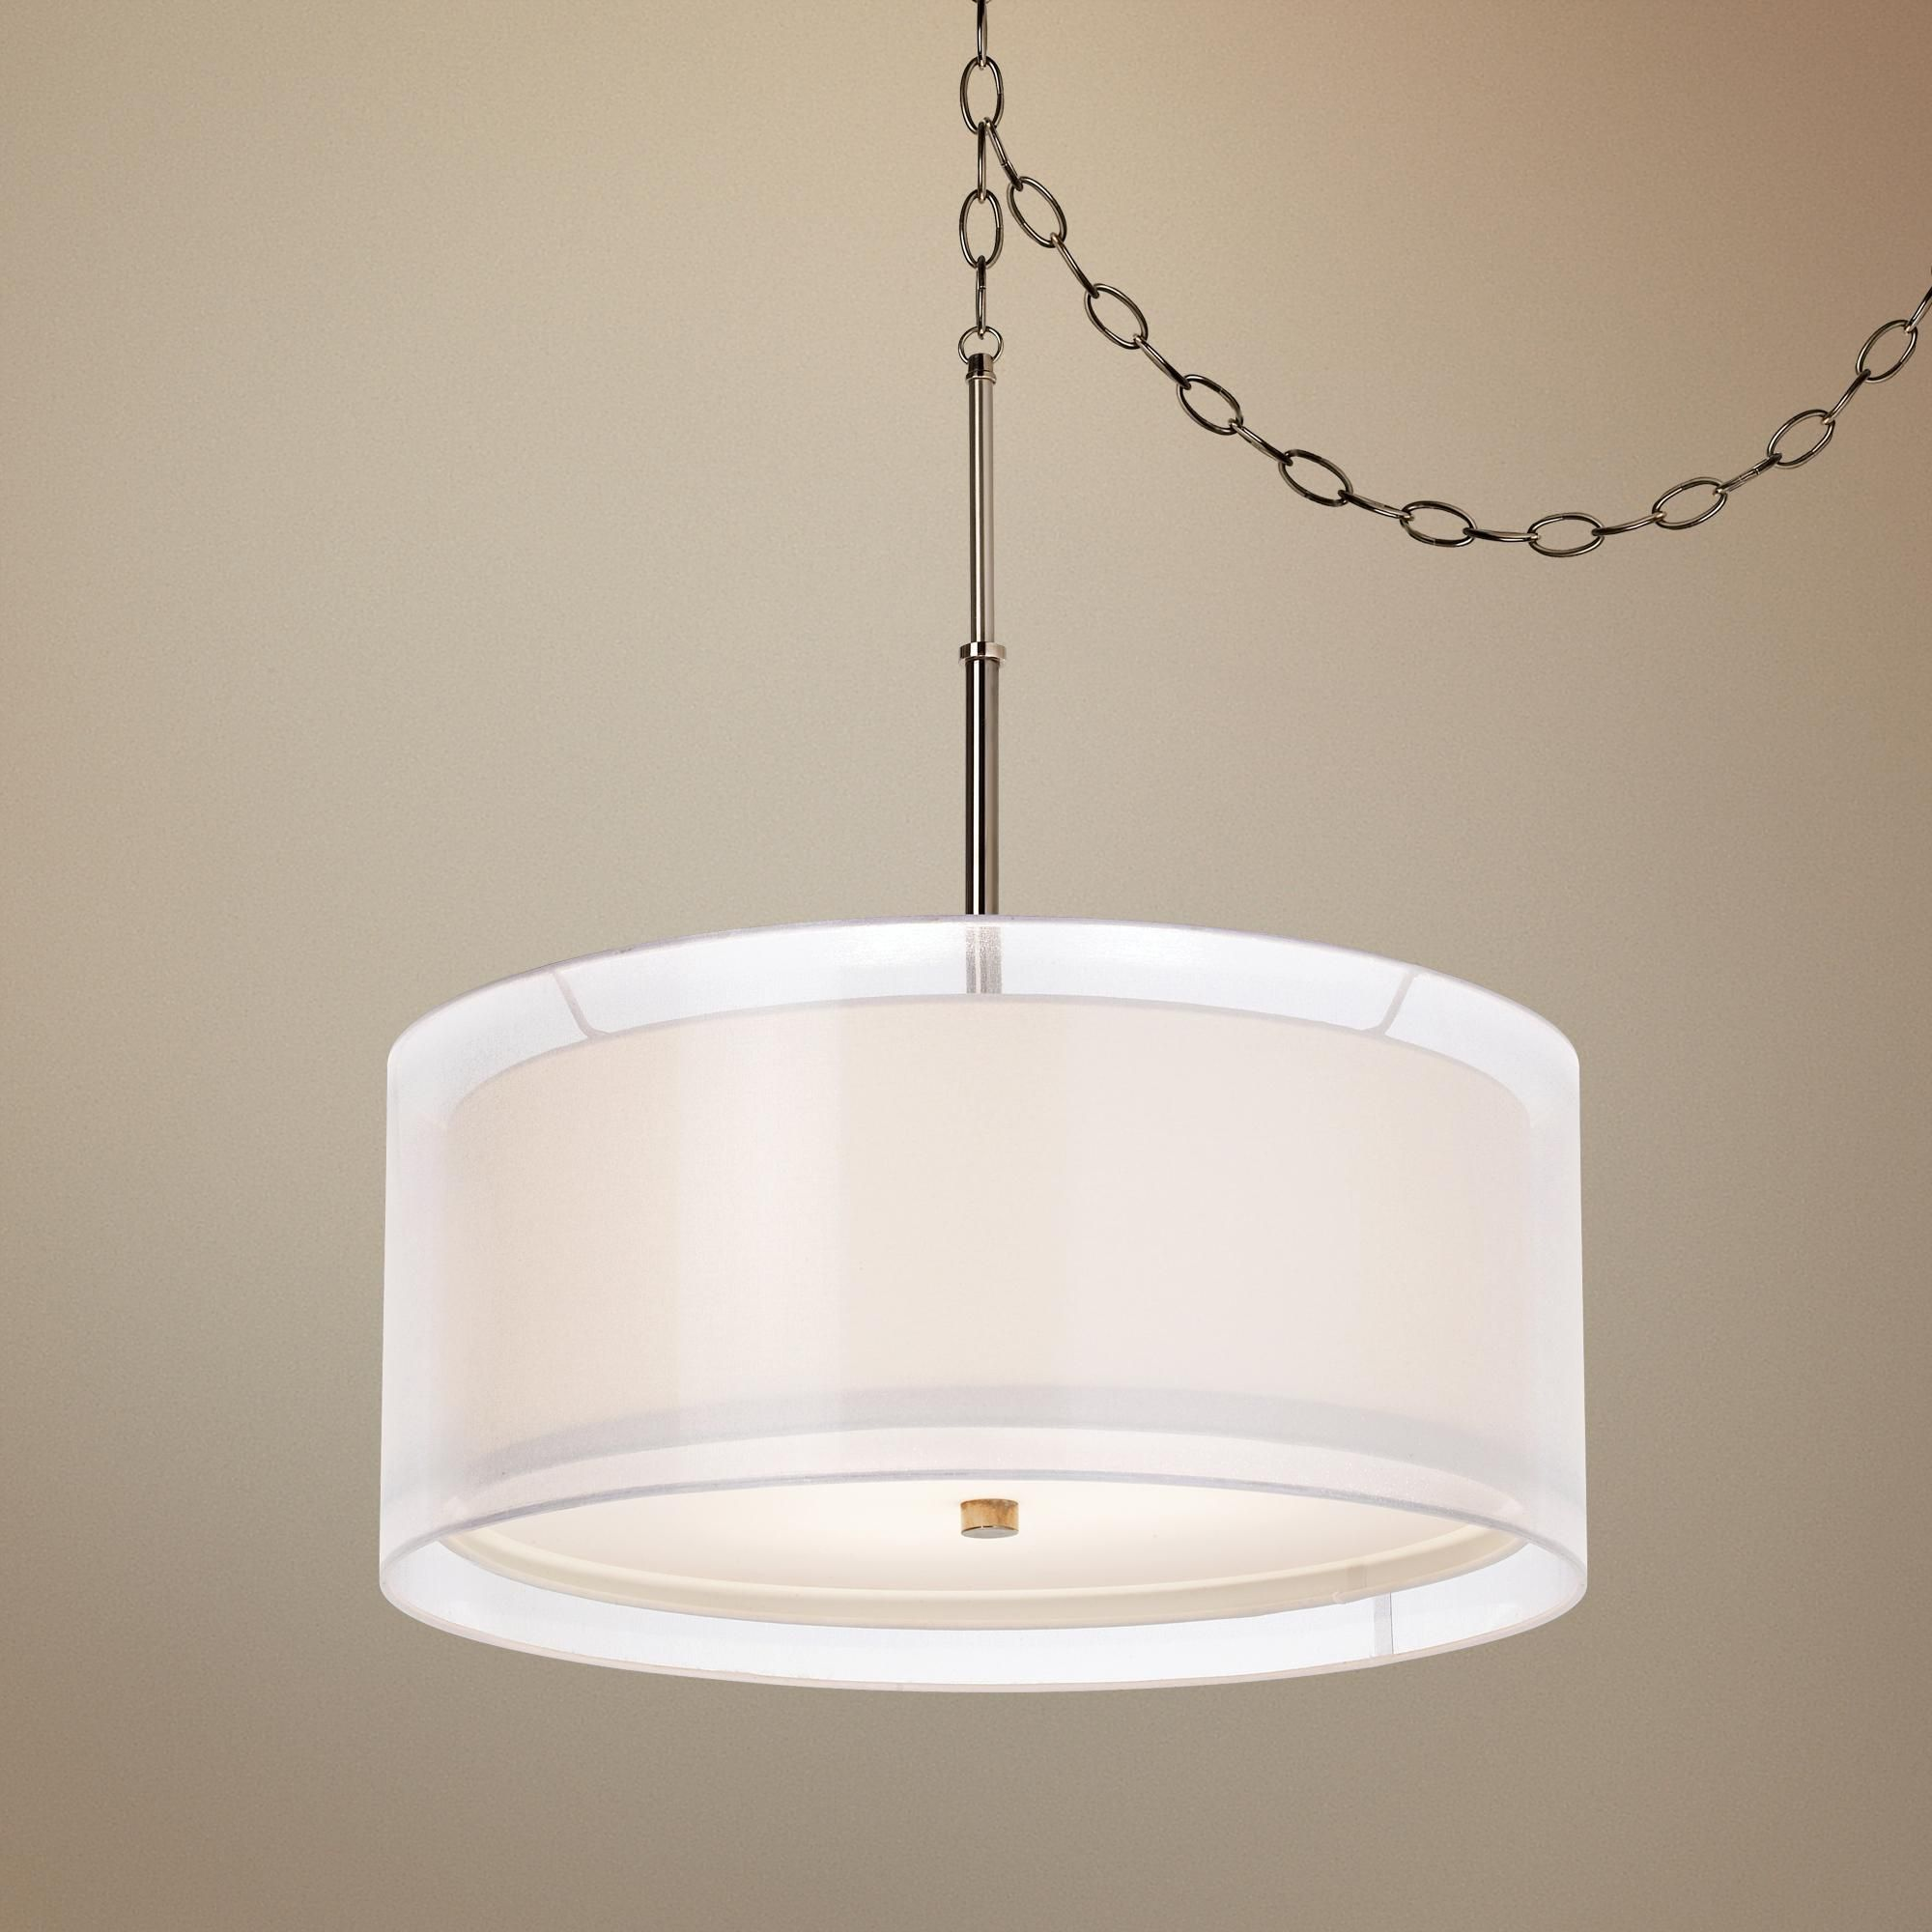 Seeri Double Shade Swag Pendant Light K4776 Lamps Plus Swag Pendant Light Swag Light Pendant Light